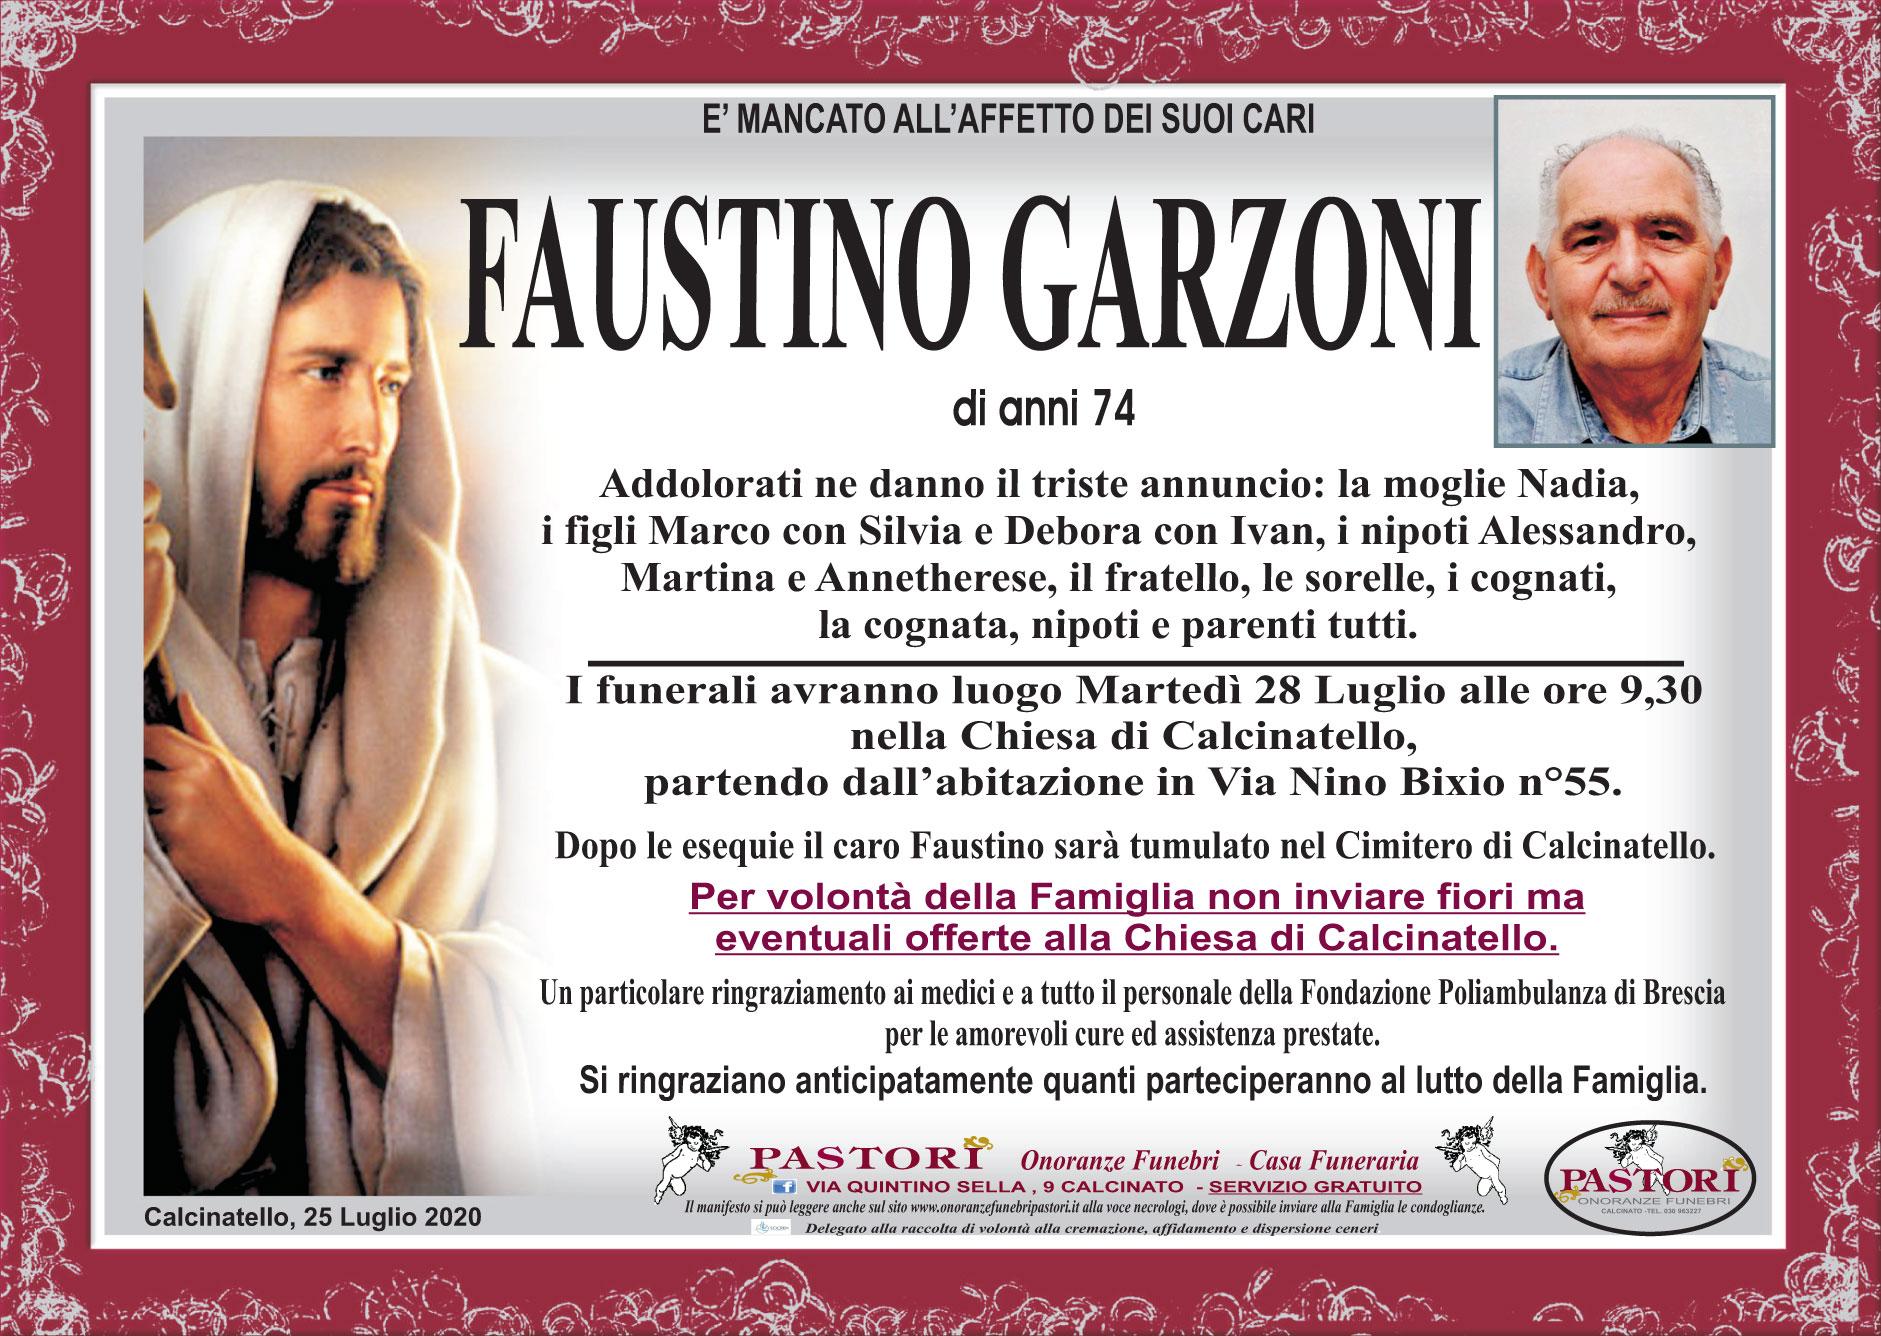 Faustino Garzoni